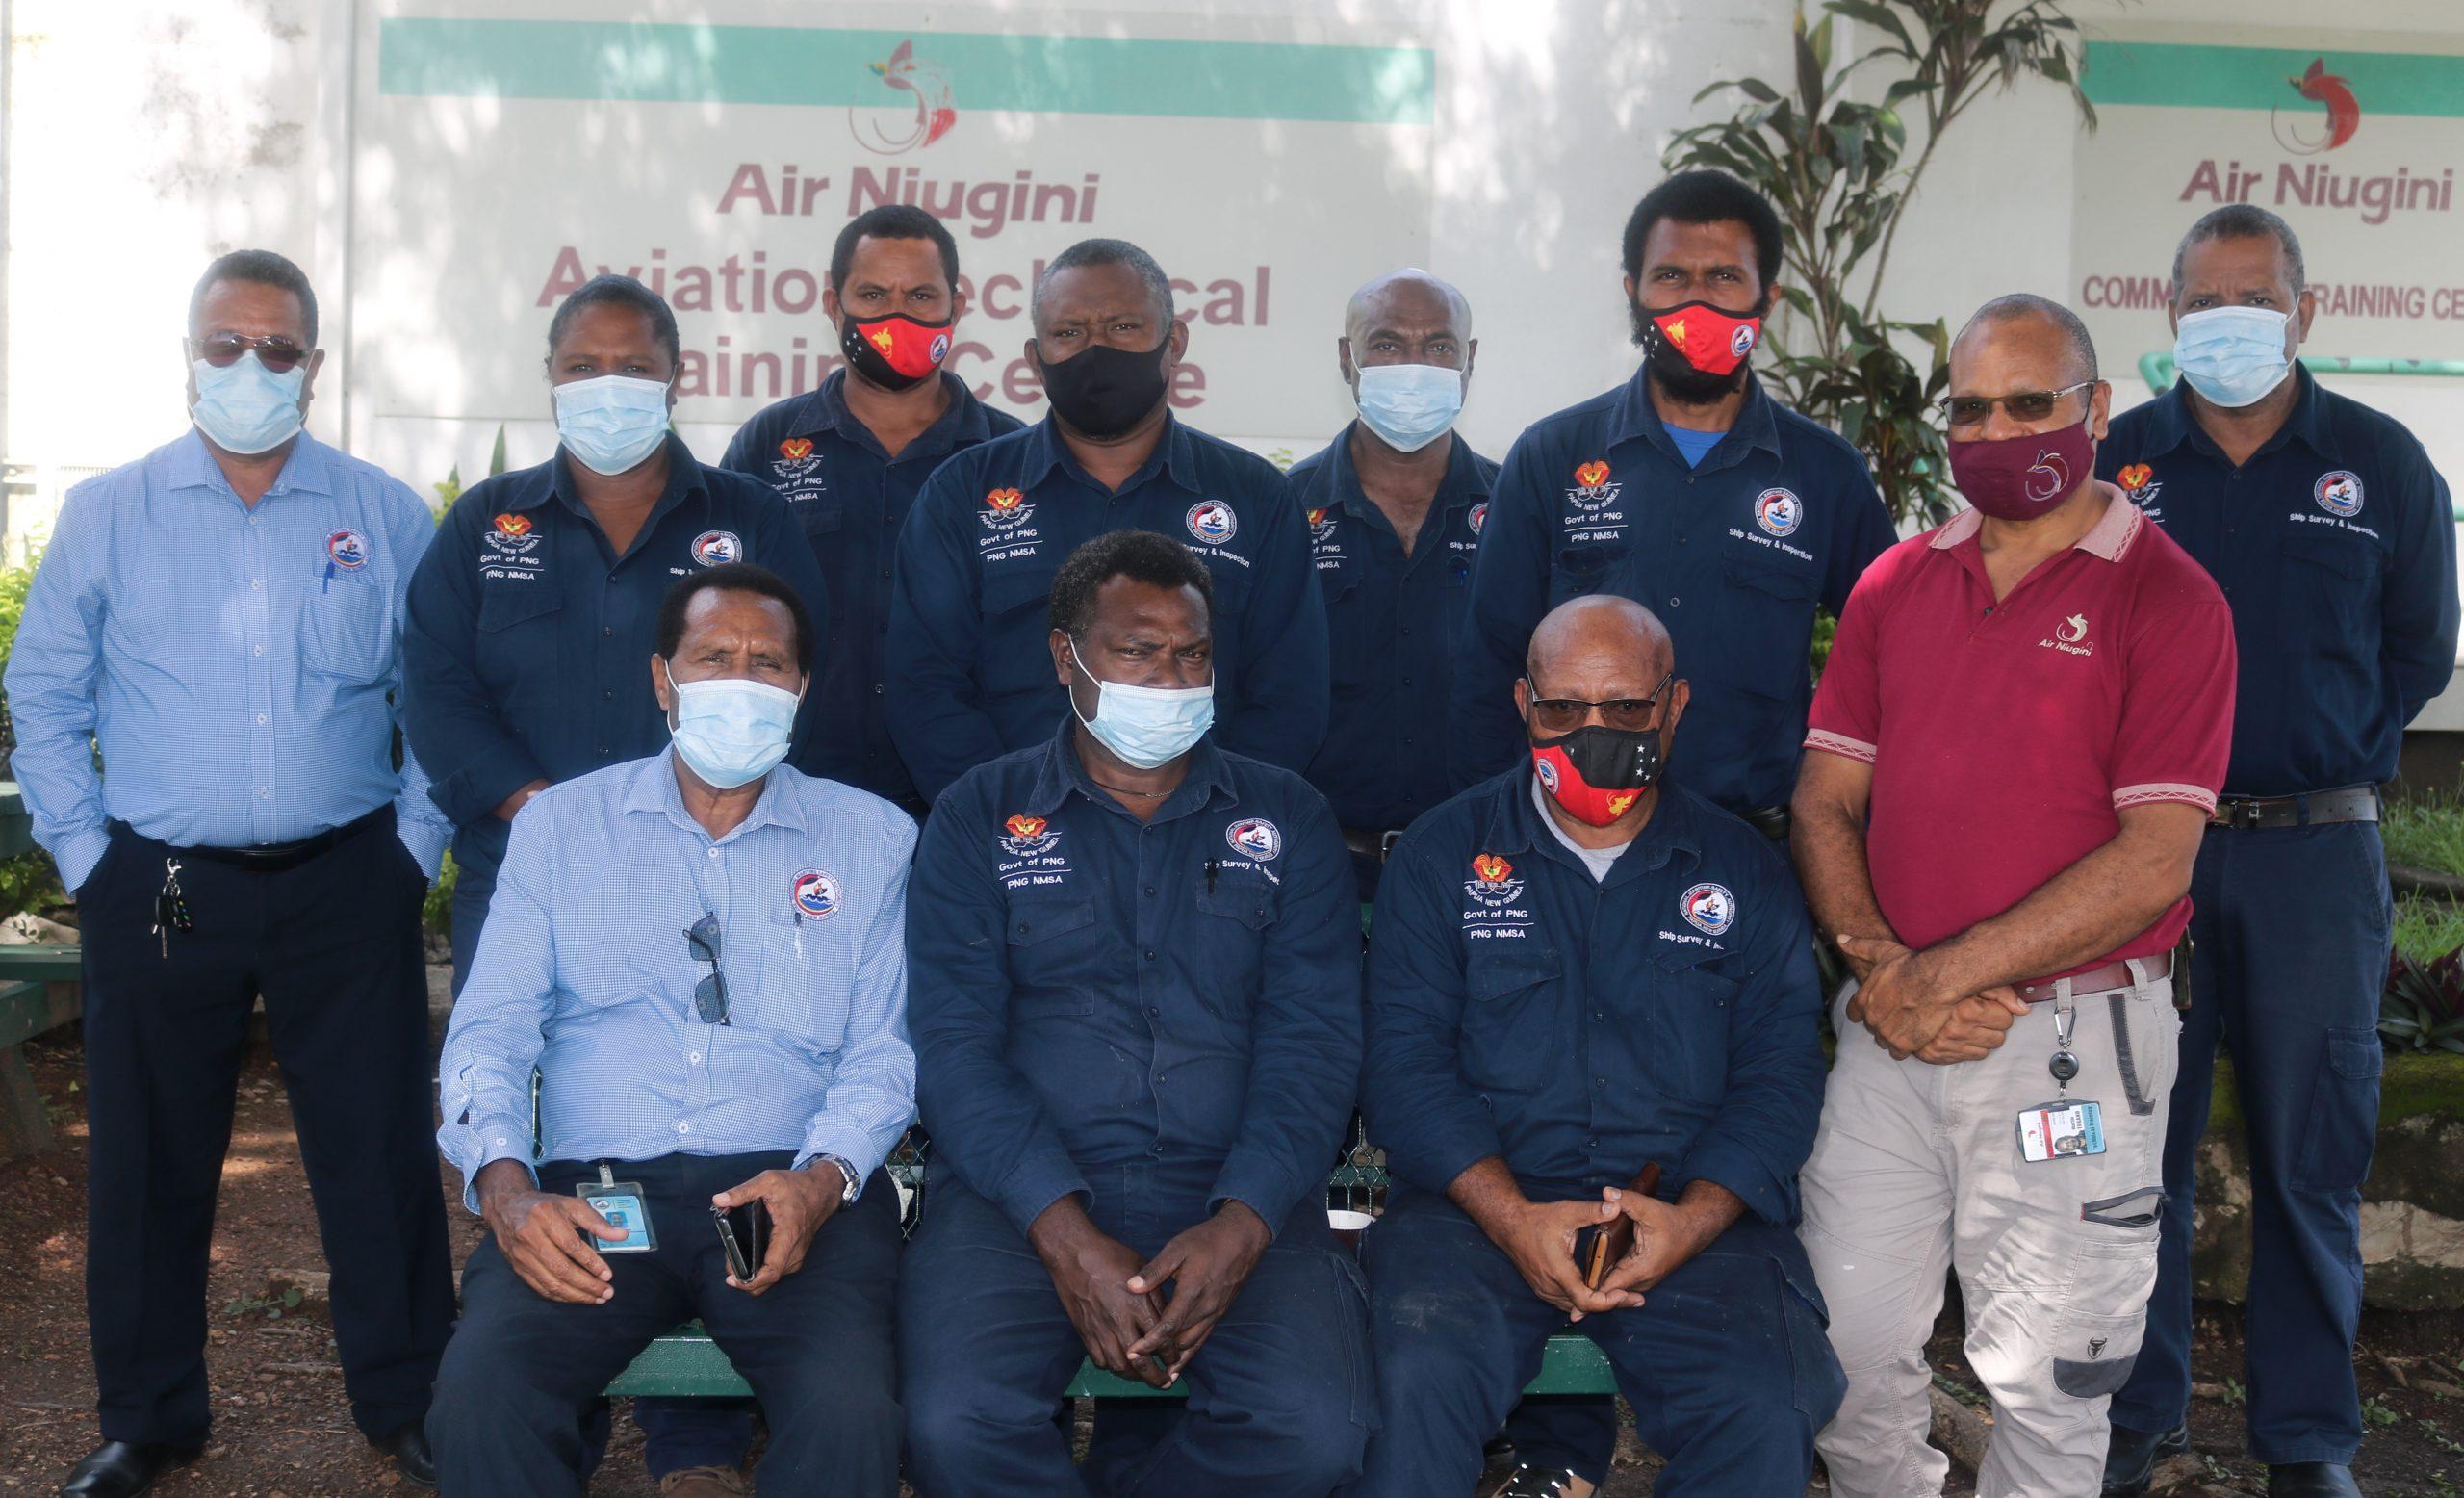 AIR NIUGINI CONDUCTS TRAINING ON INTERNATIONAL  MARITIME DANGEROUS GOODS FOR NMSA